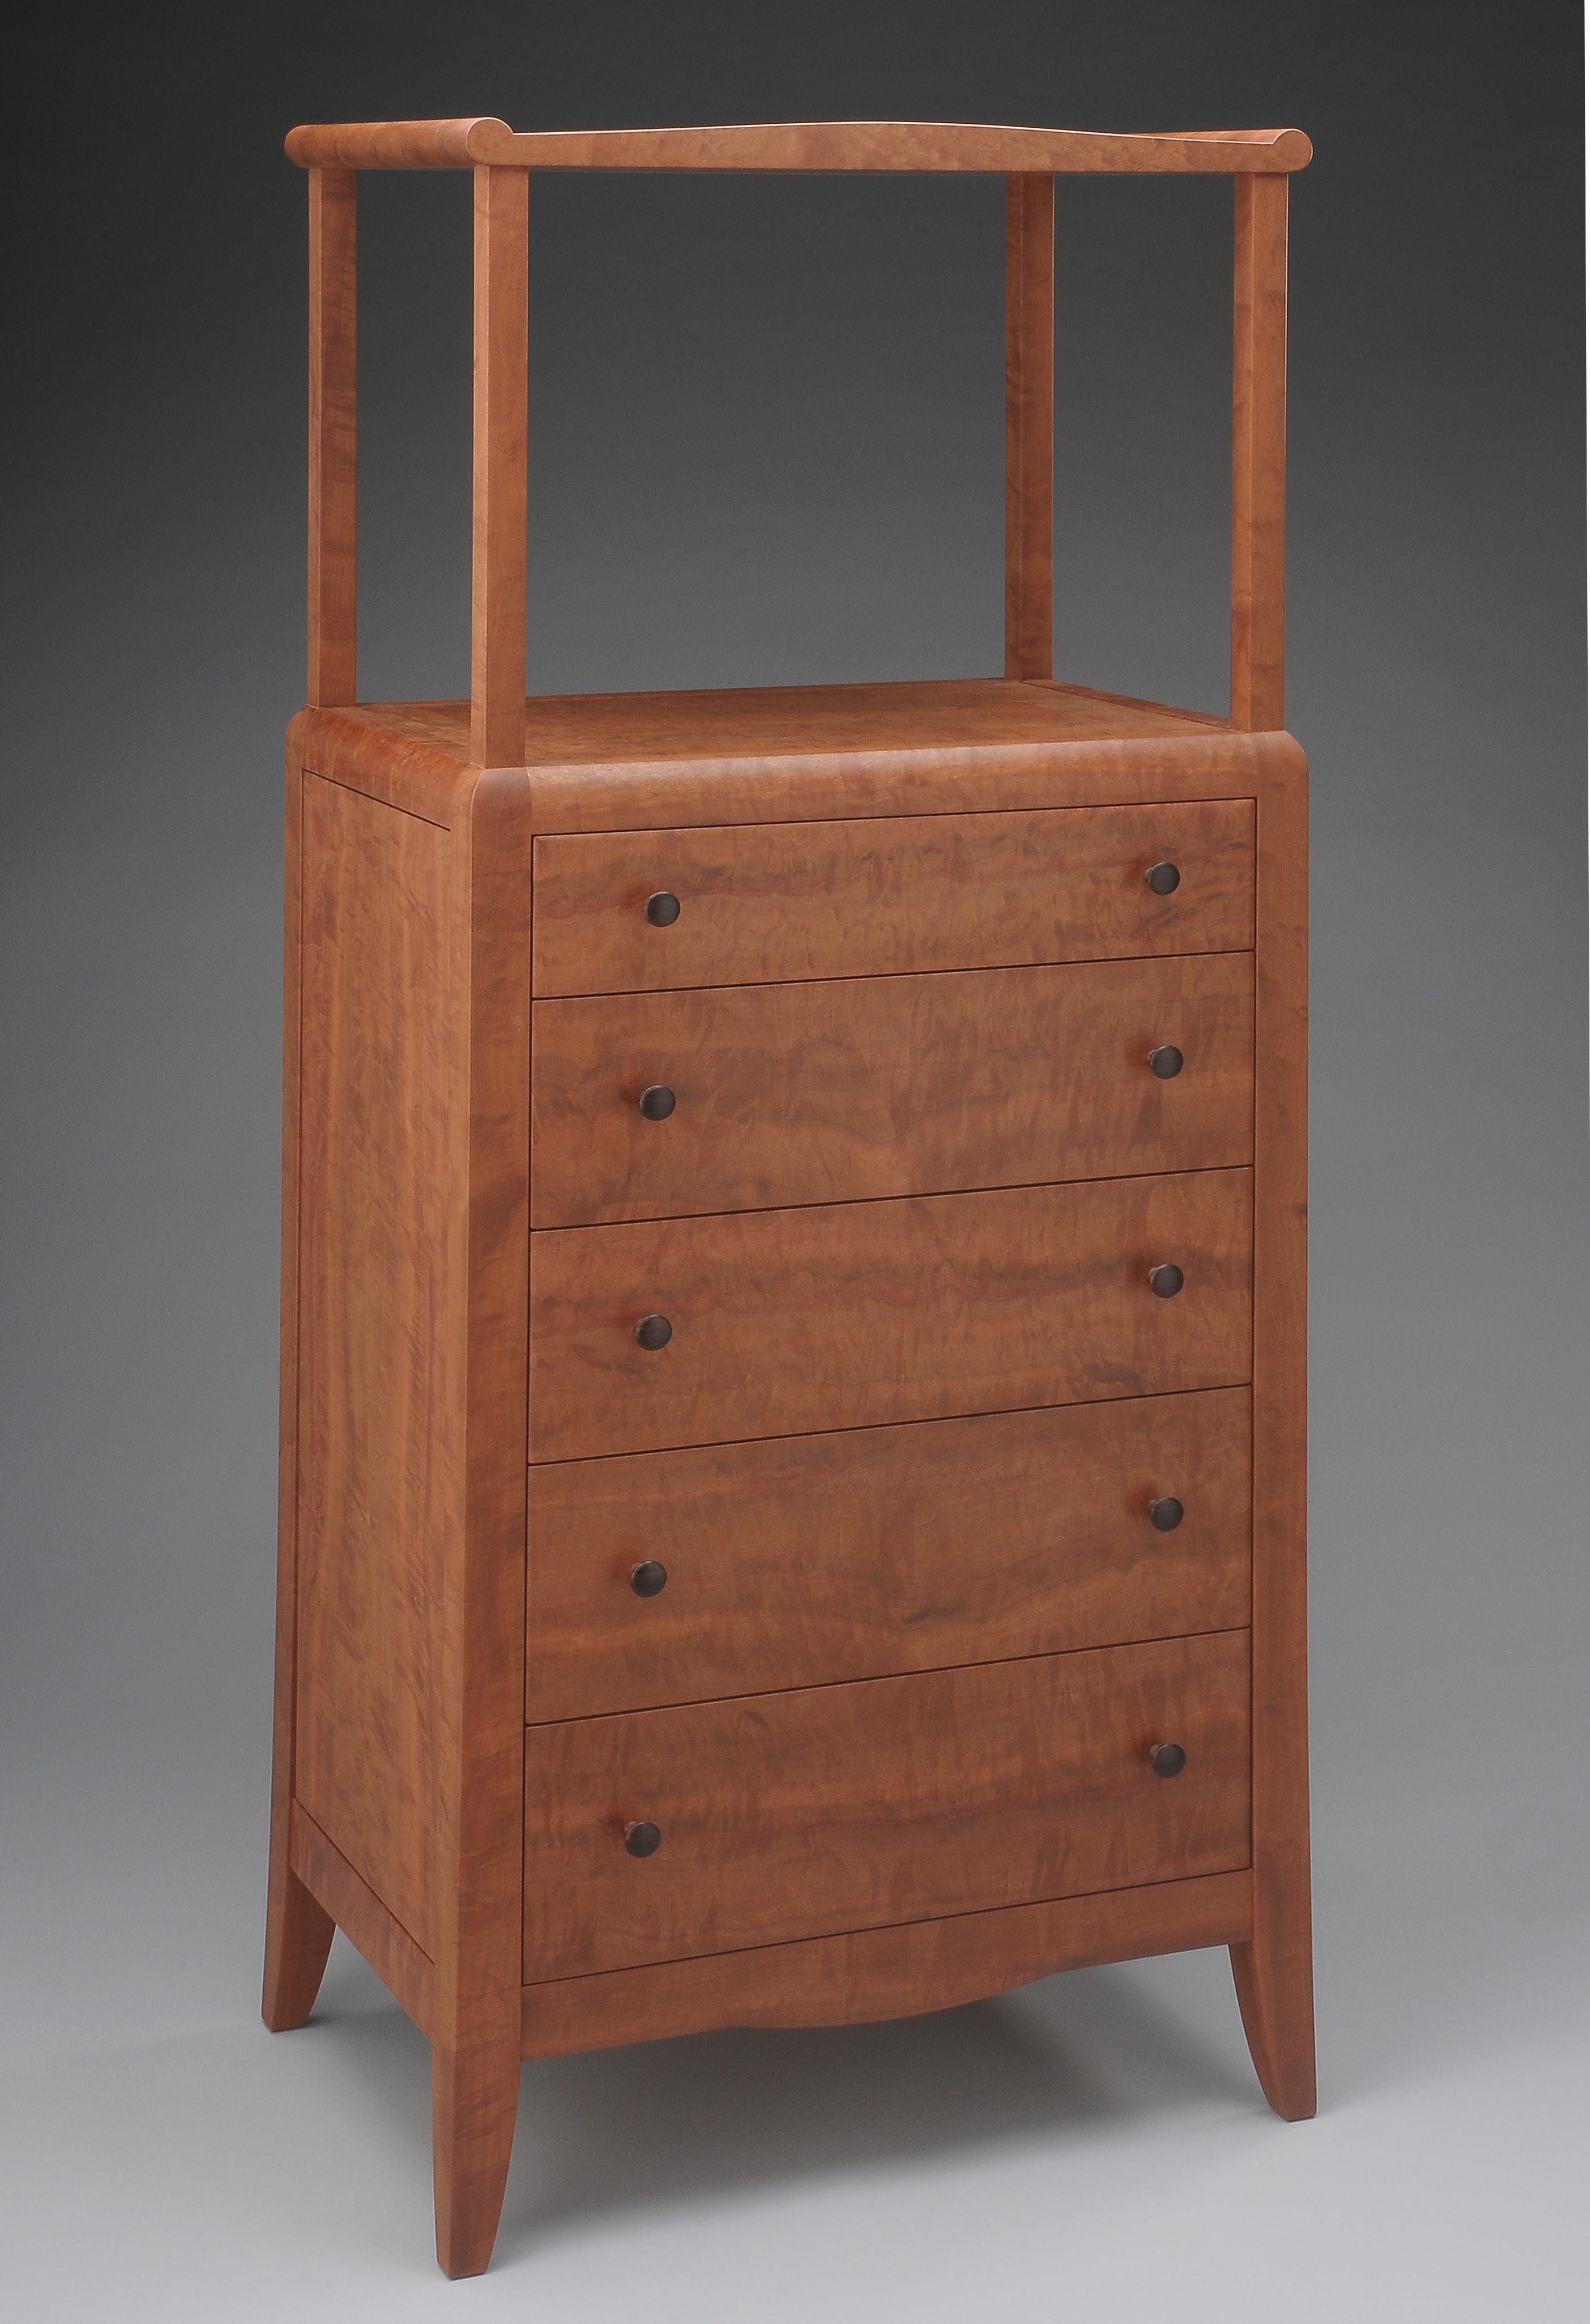 custom handmade chest drawers by furniture master tim coleman